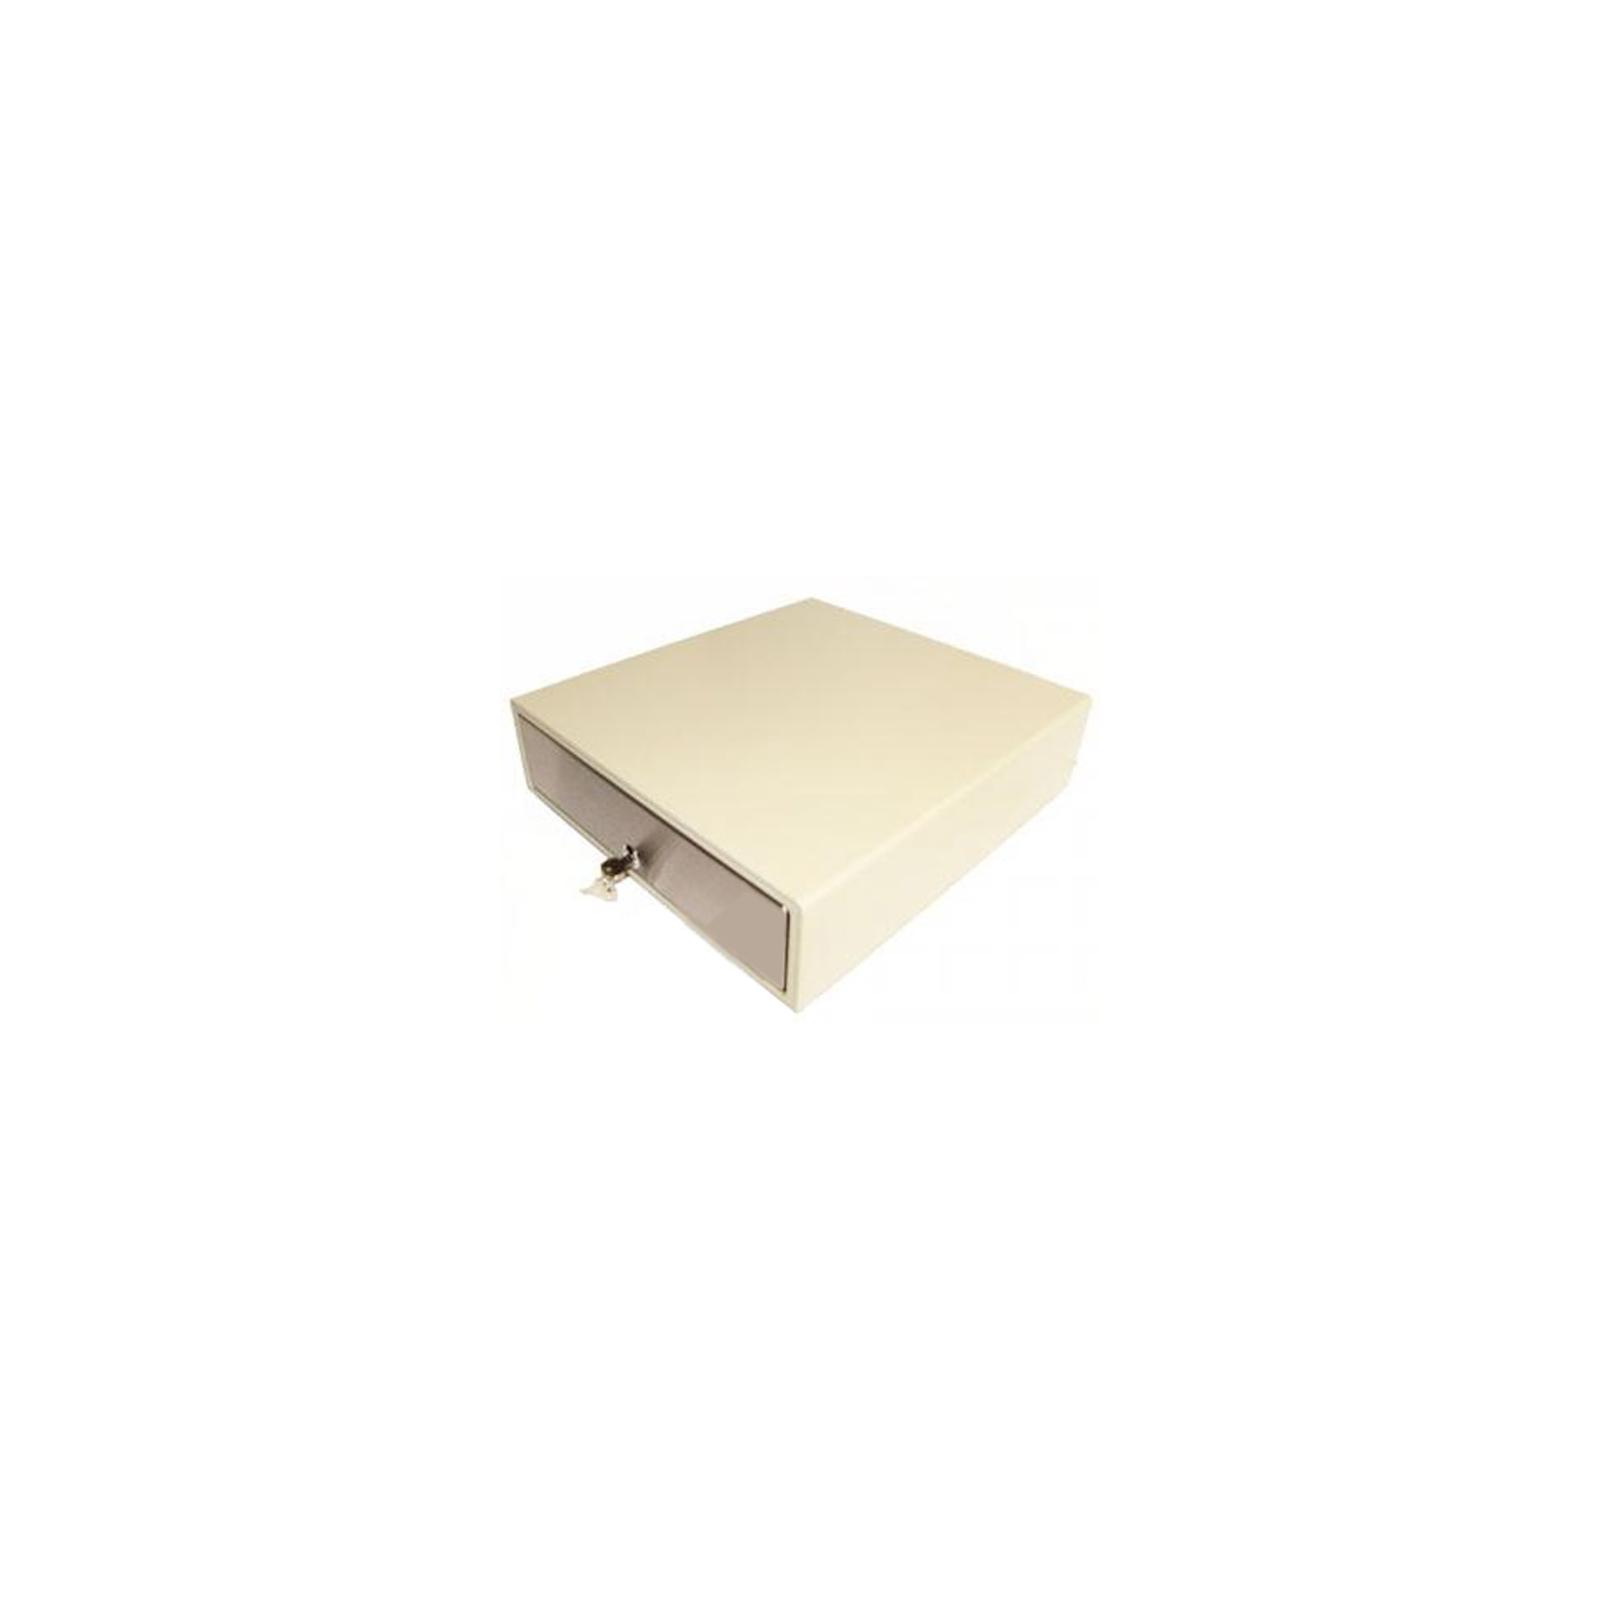 Денежный ящик HPC System HPC 13S Wh 6V (287)